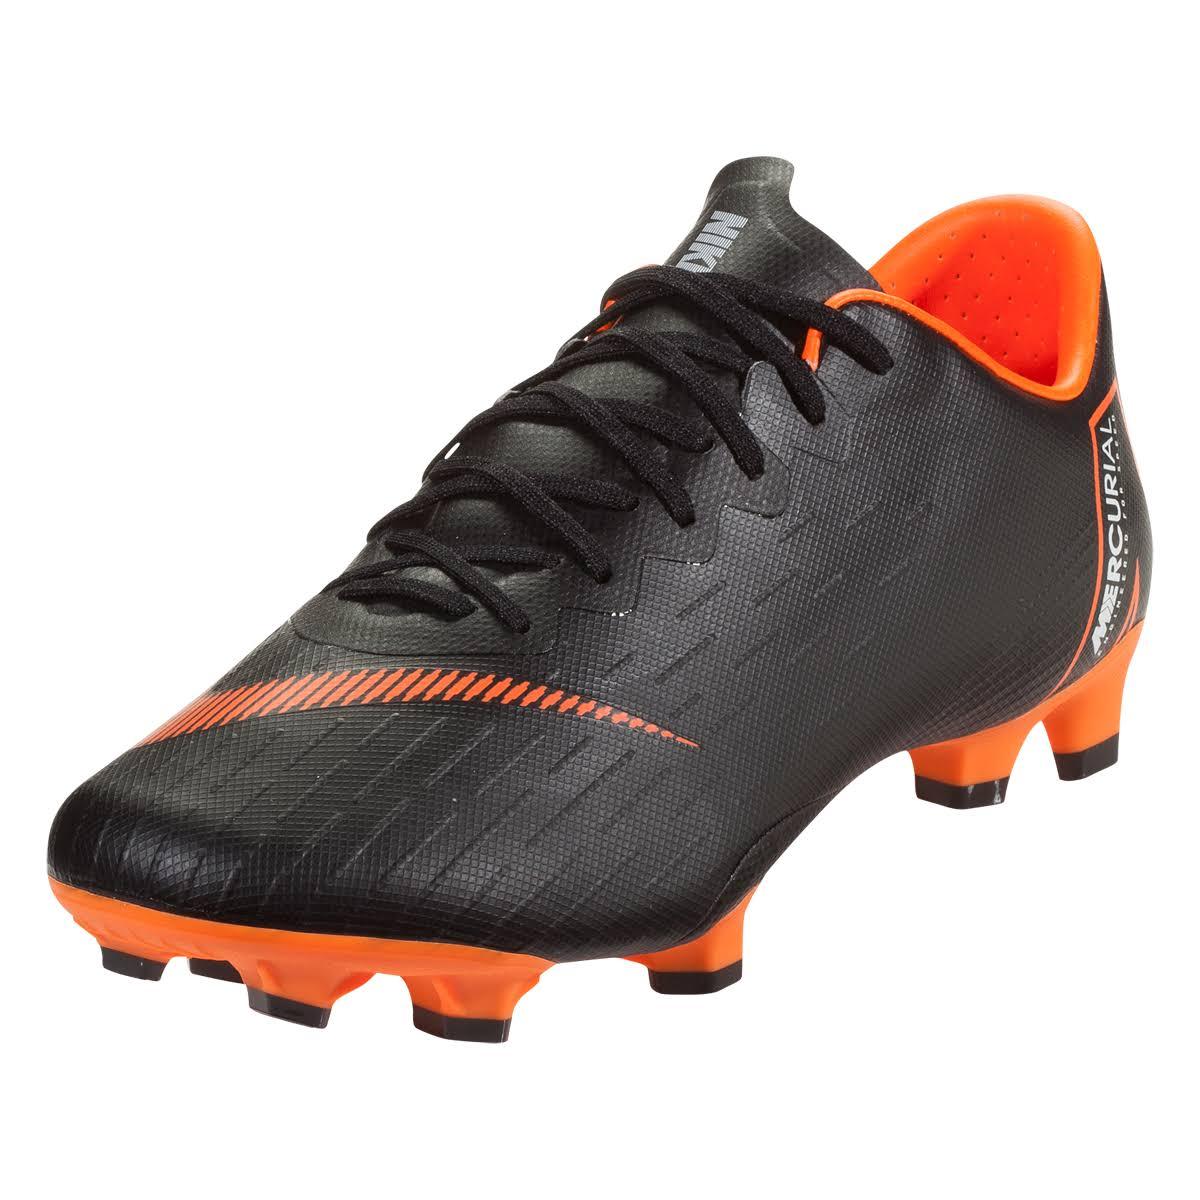 Total Ah7382081 De Fg Naranja Fútbol Tamaño Nike 5 12 Pro Mercurial 6 Blanco Para Tacos Vapor Hombre Negro 1awpZqwv